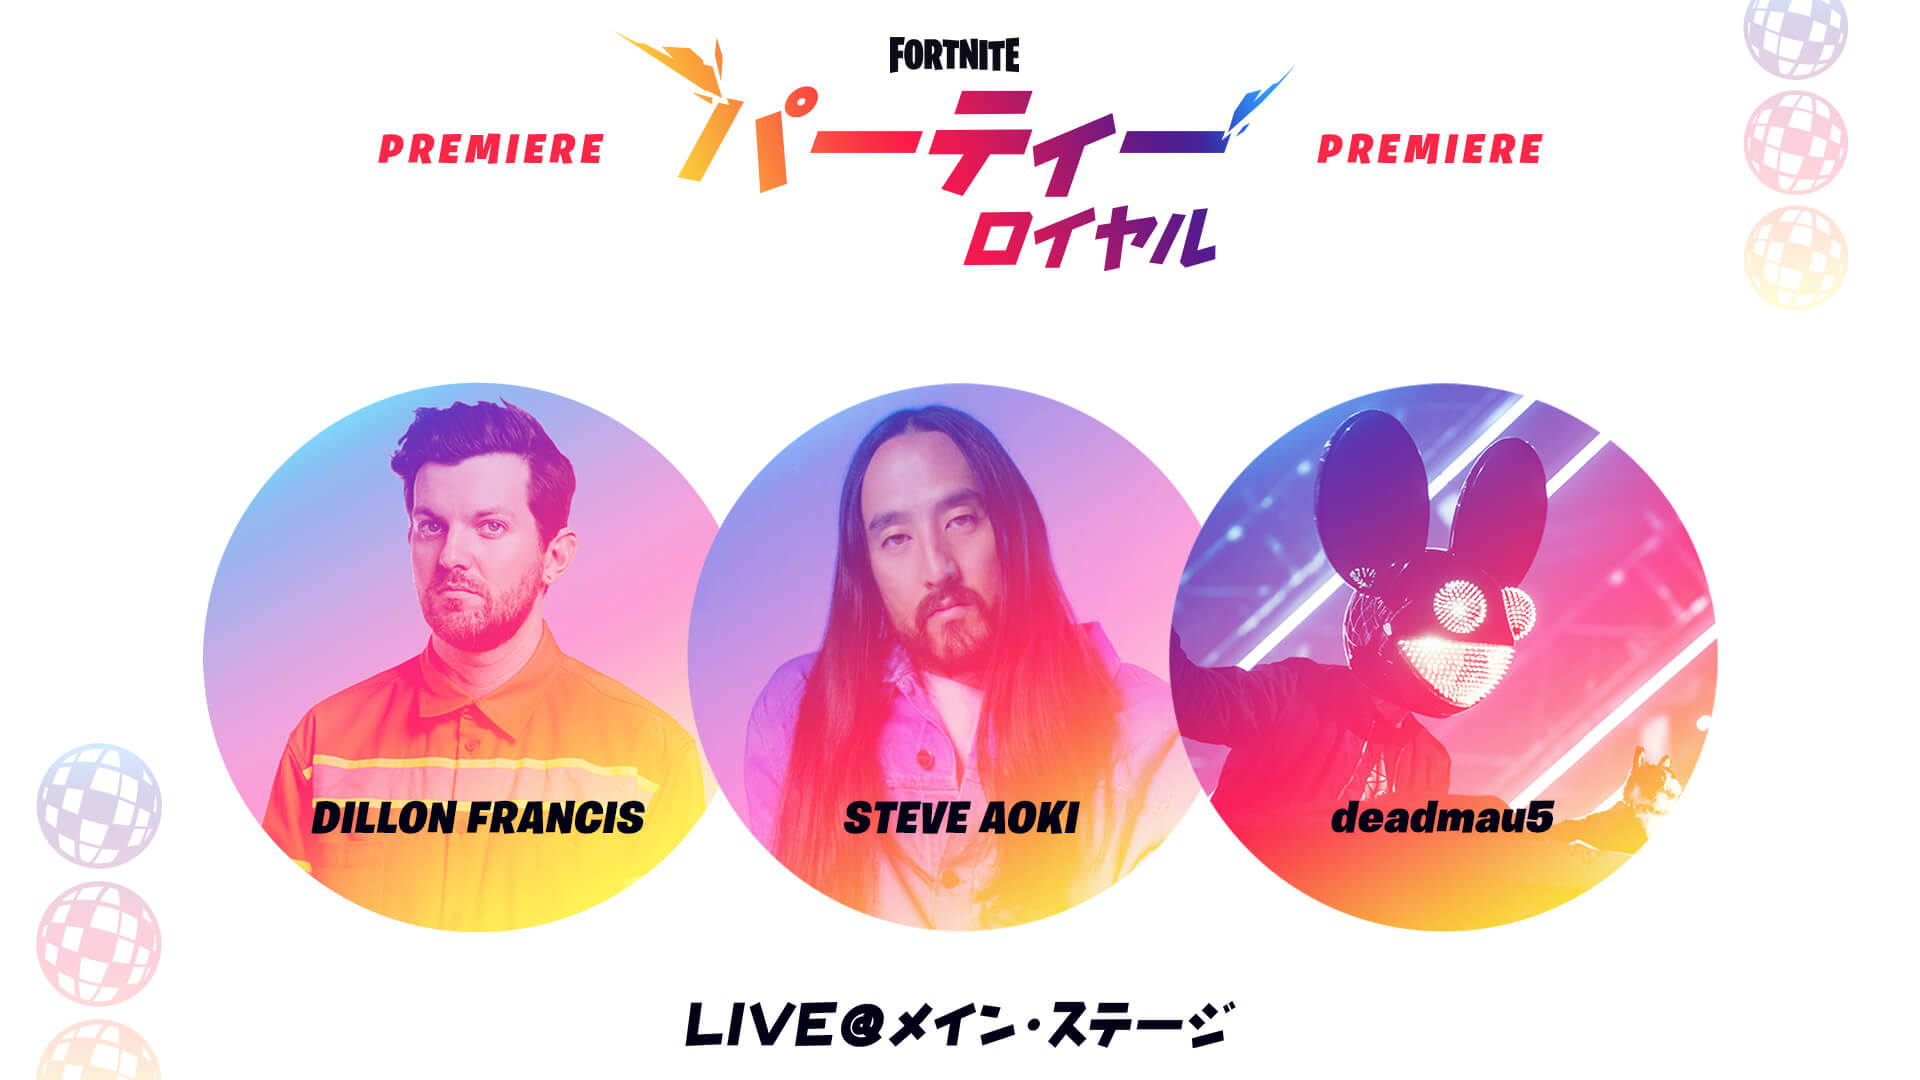 JP_12PR_Premiere_Reveal_deadmau5_Social.jpg